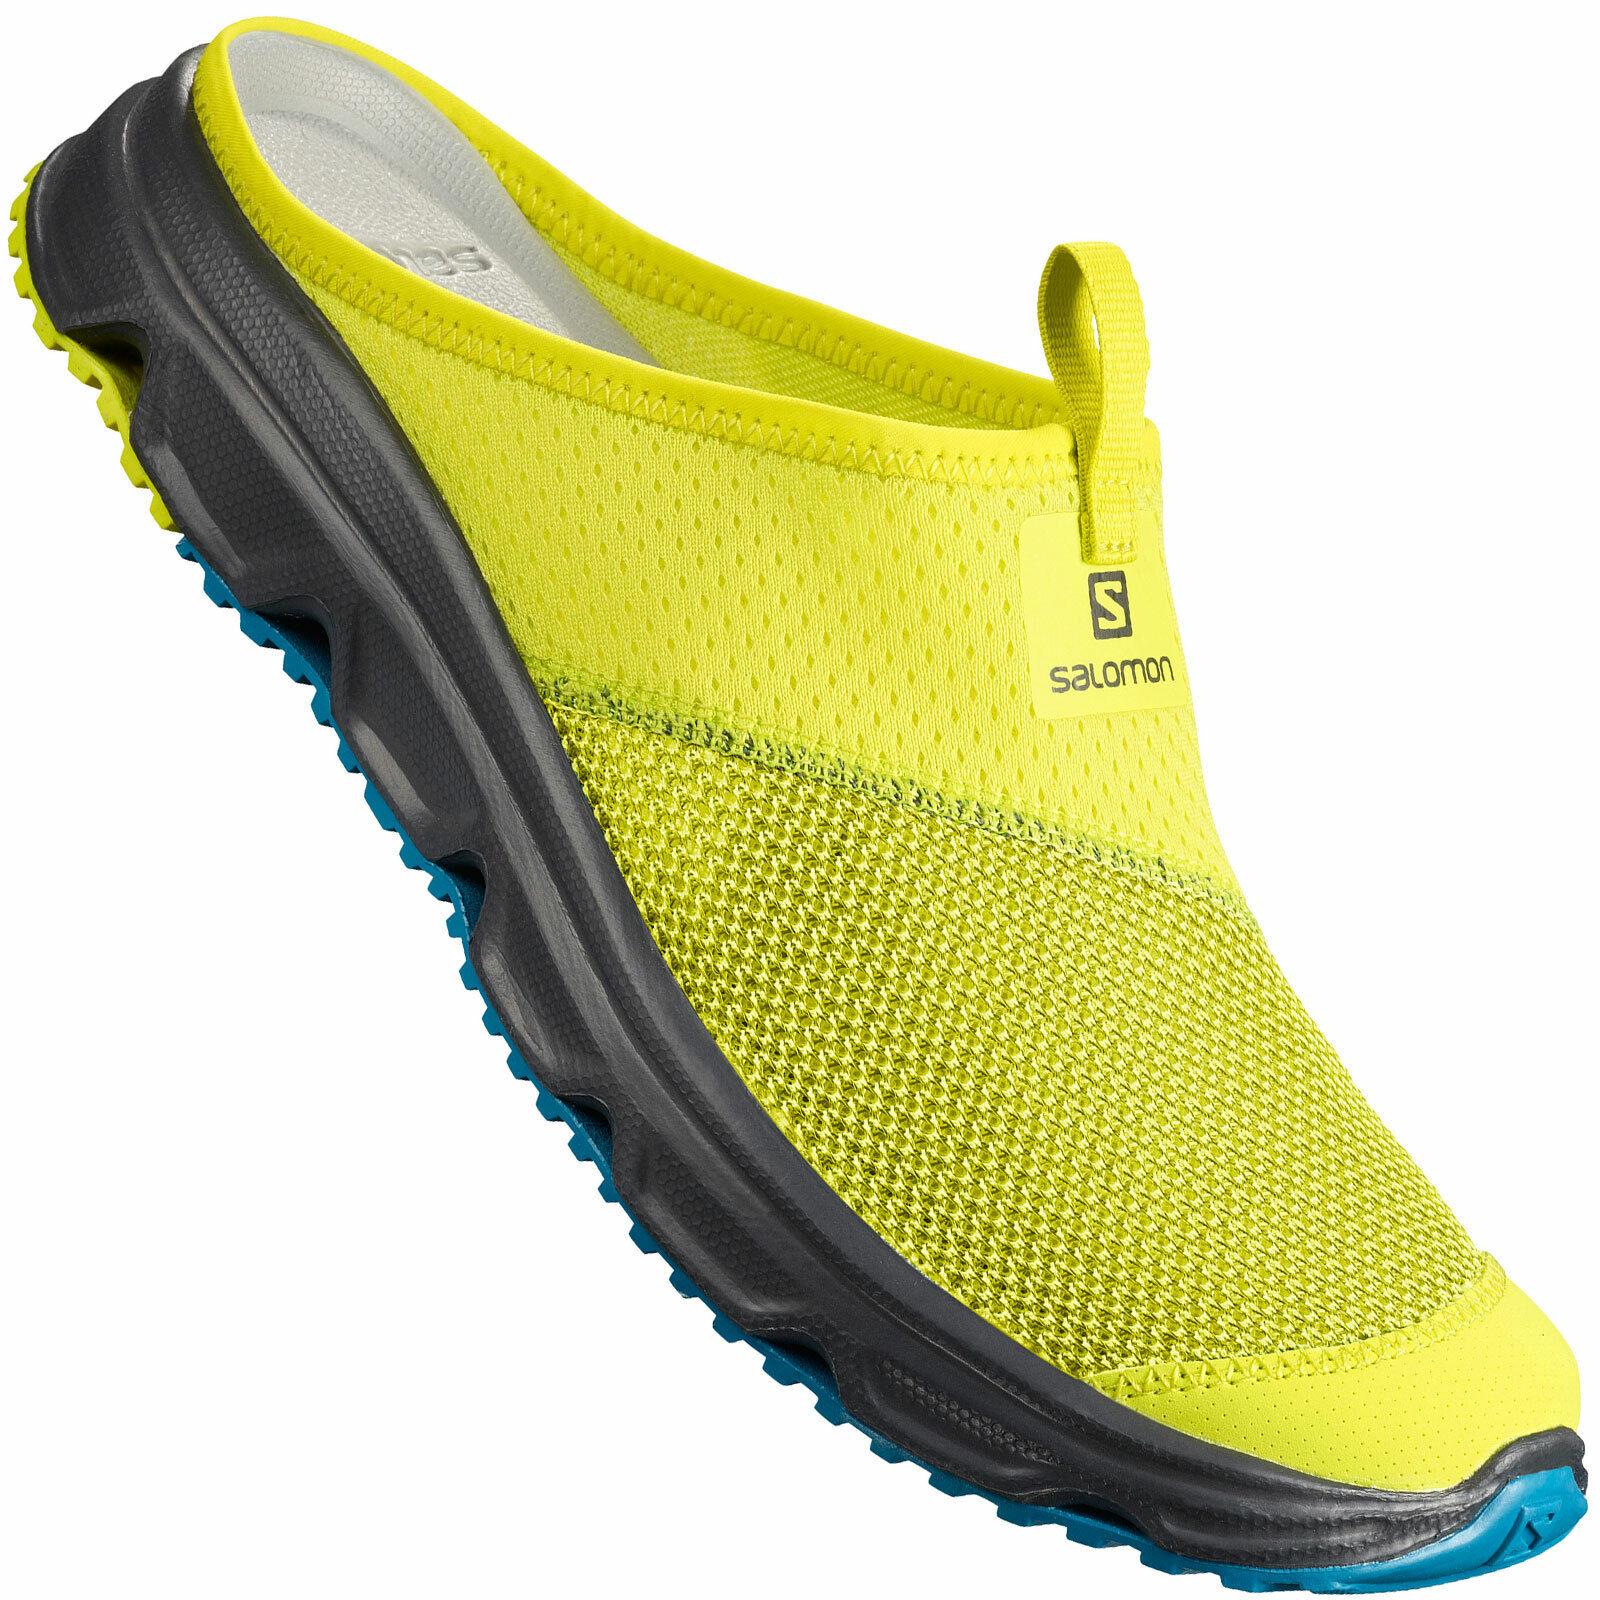 salomon rx slide 3.0 slipper clogs gold